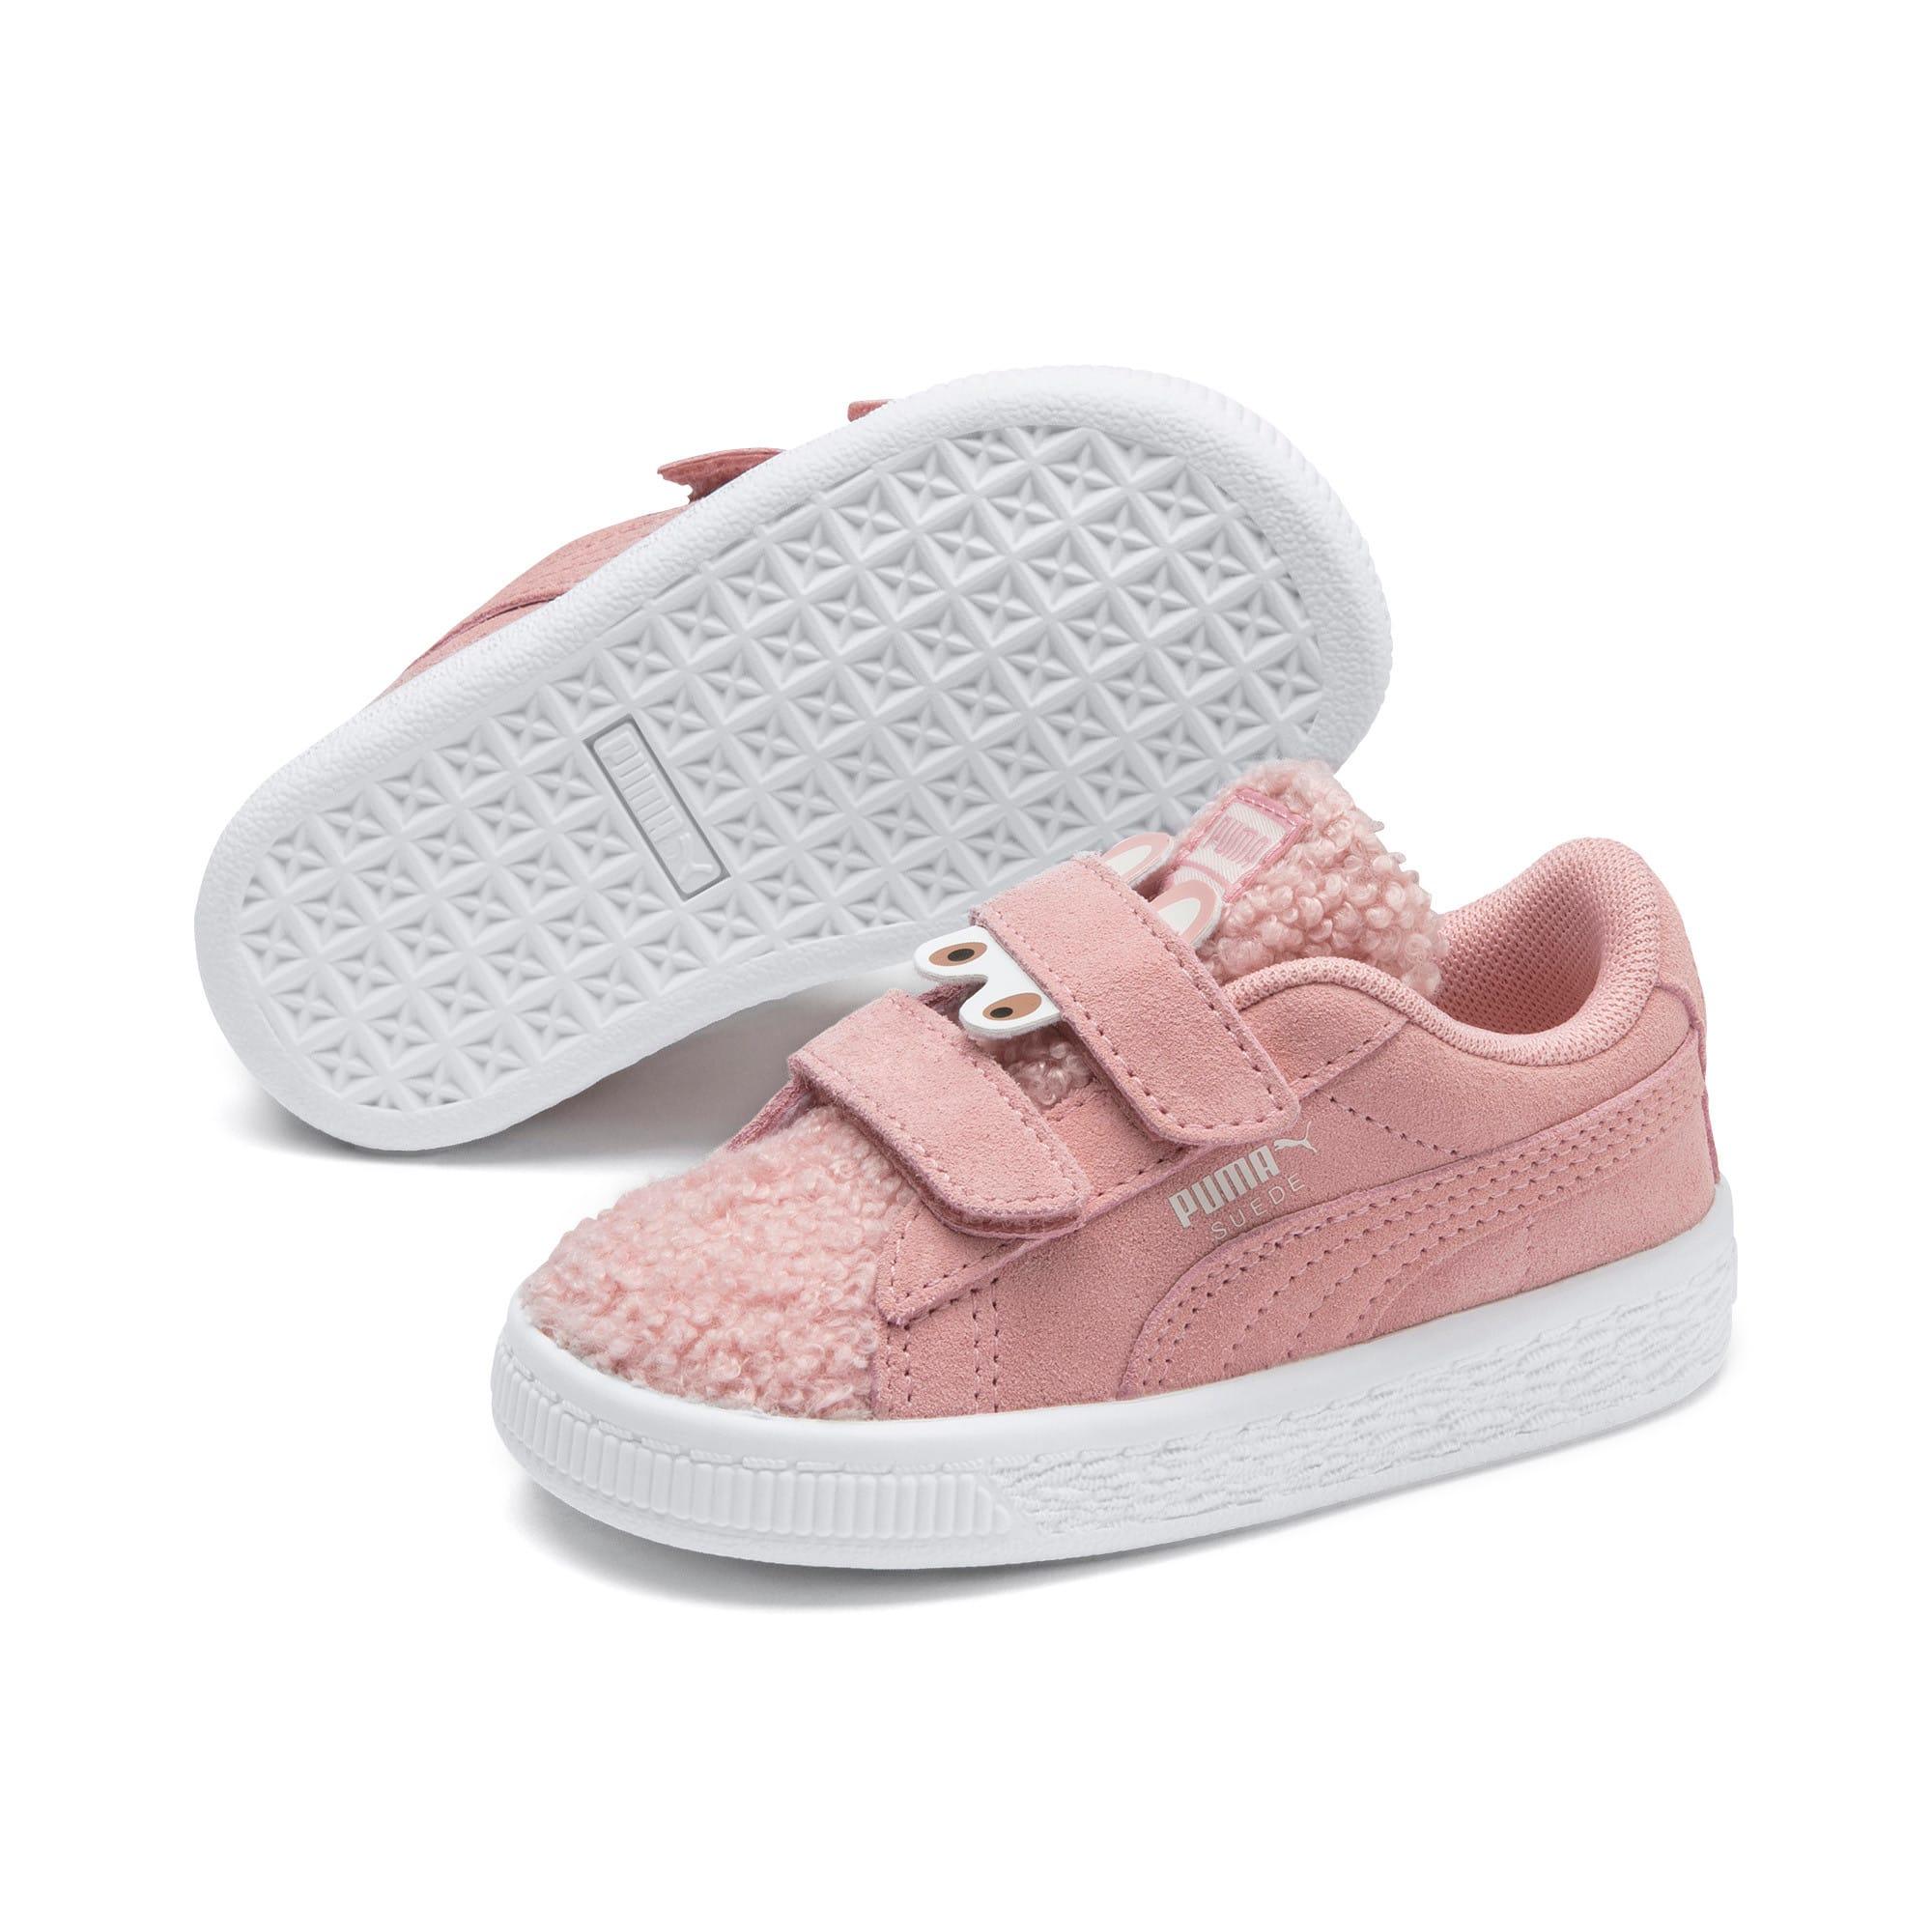 Thumbnail 2 of Suede Winter Monster Toddler Shoes, Bridal Rose-Mocha Mousse, medium